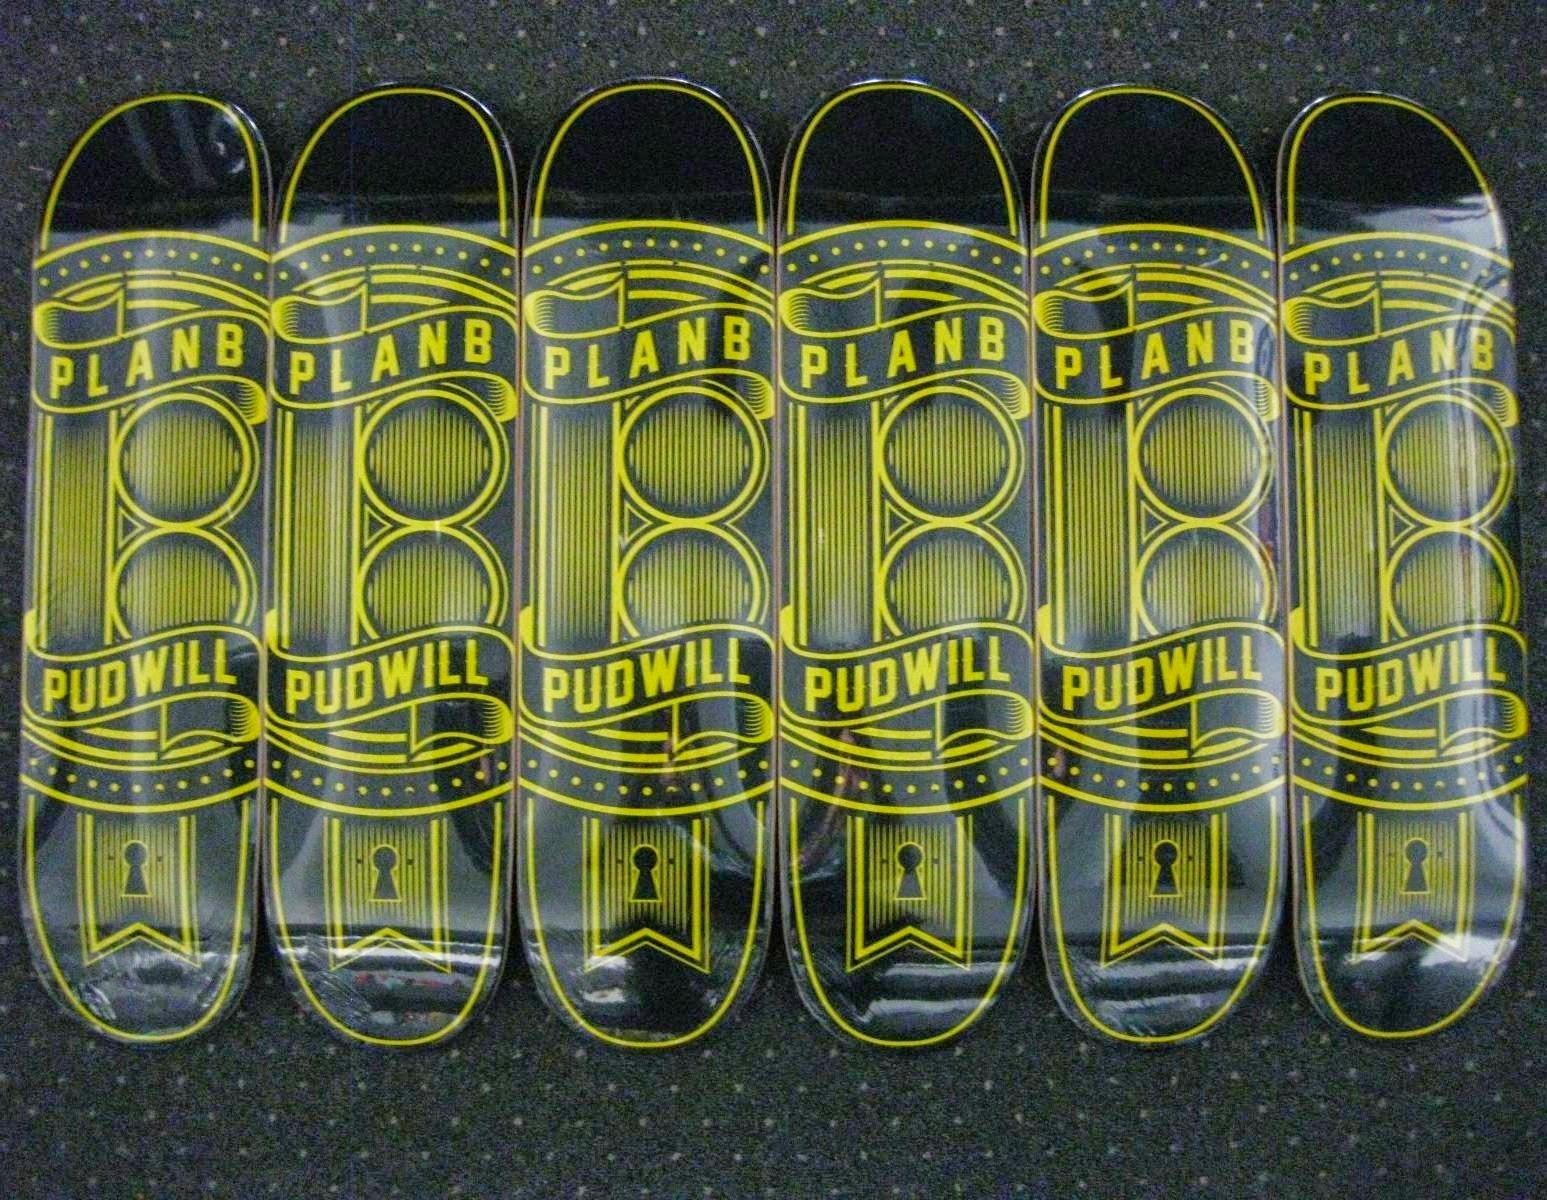 Aljek plan b size 80 decks at aljek 35 plan b size 80 decks at aljek 35 baanklon Gallery